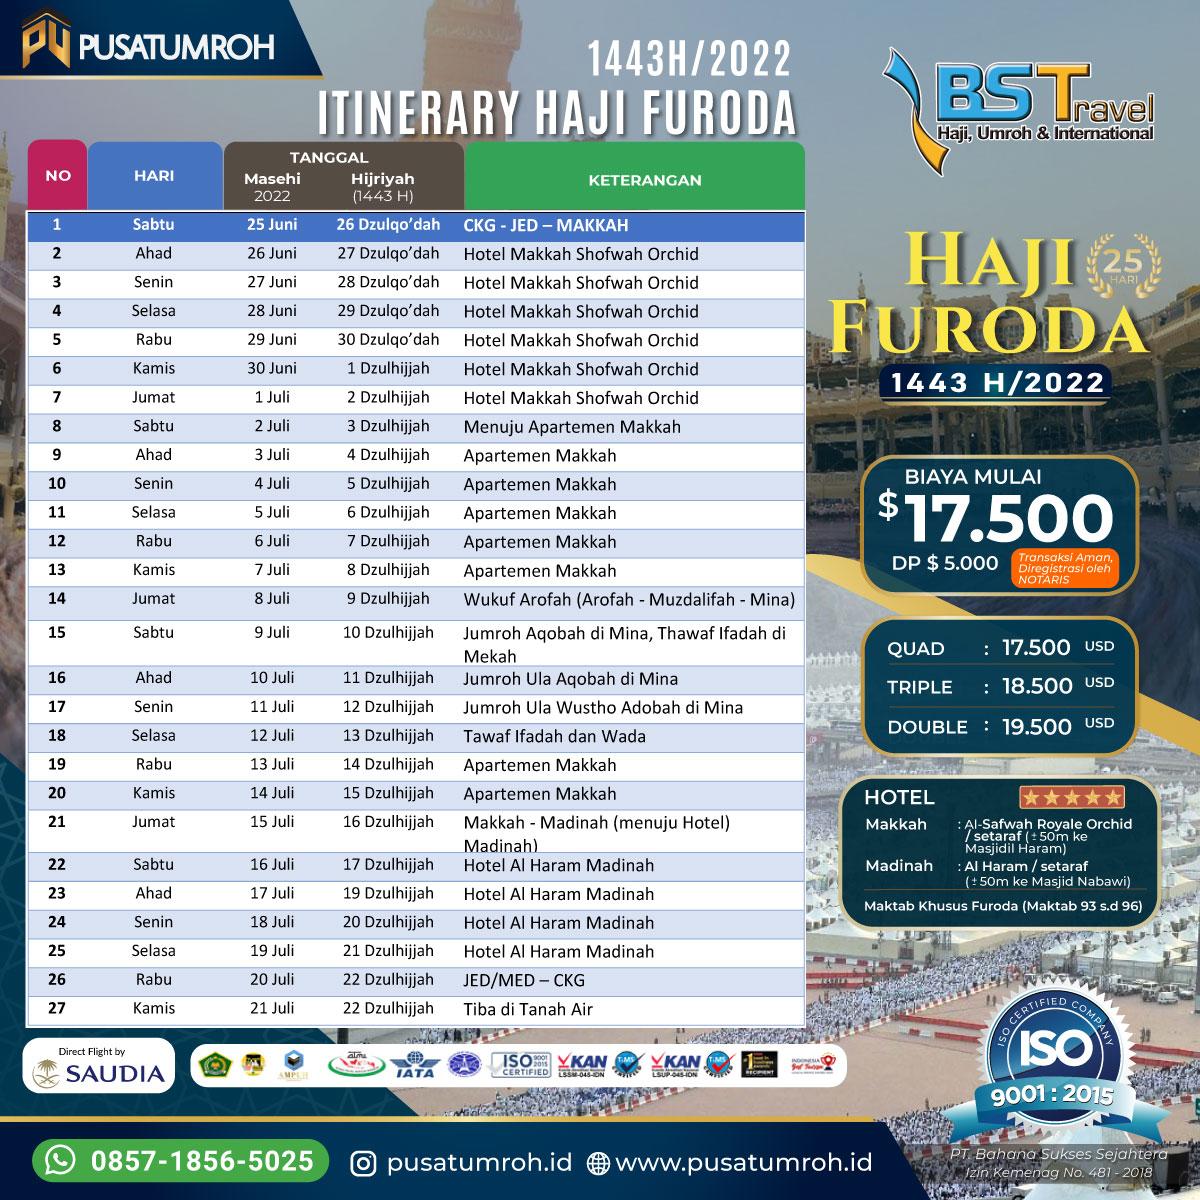 Itinerary Haji Furoda 2022